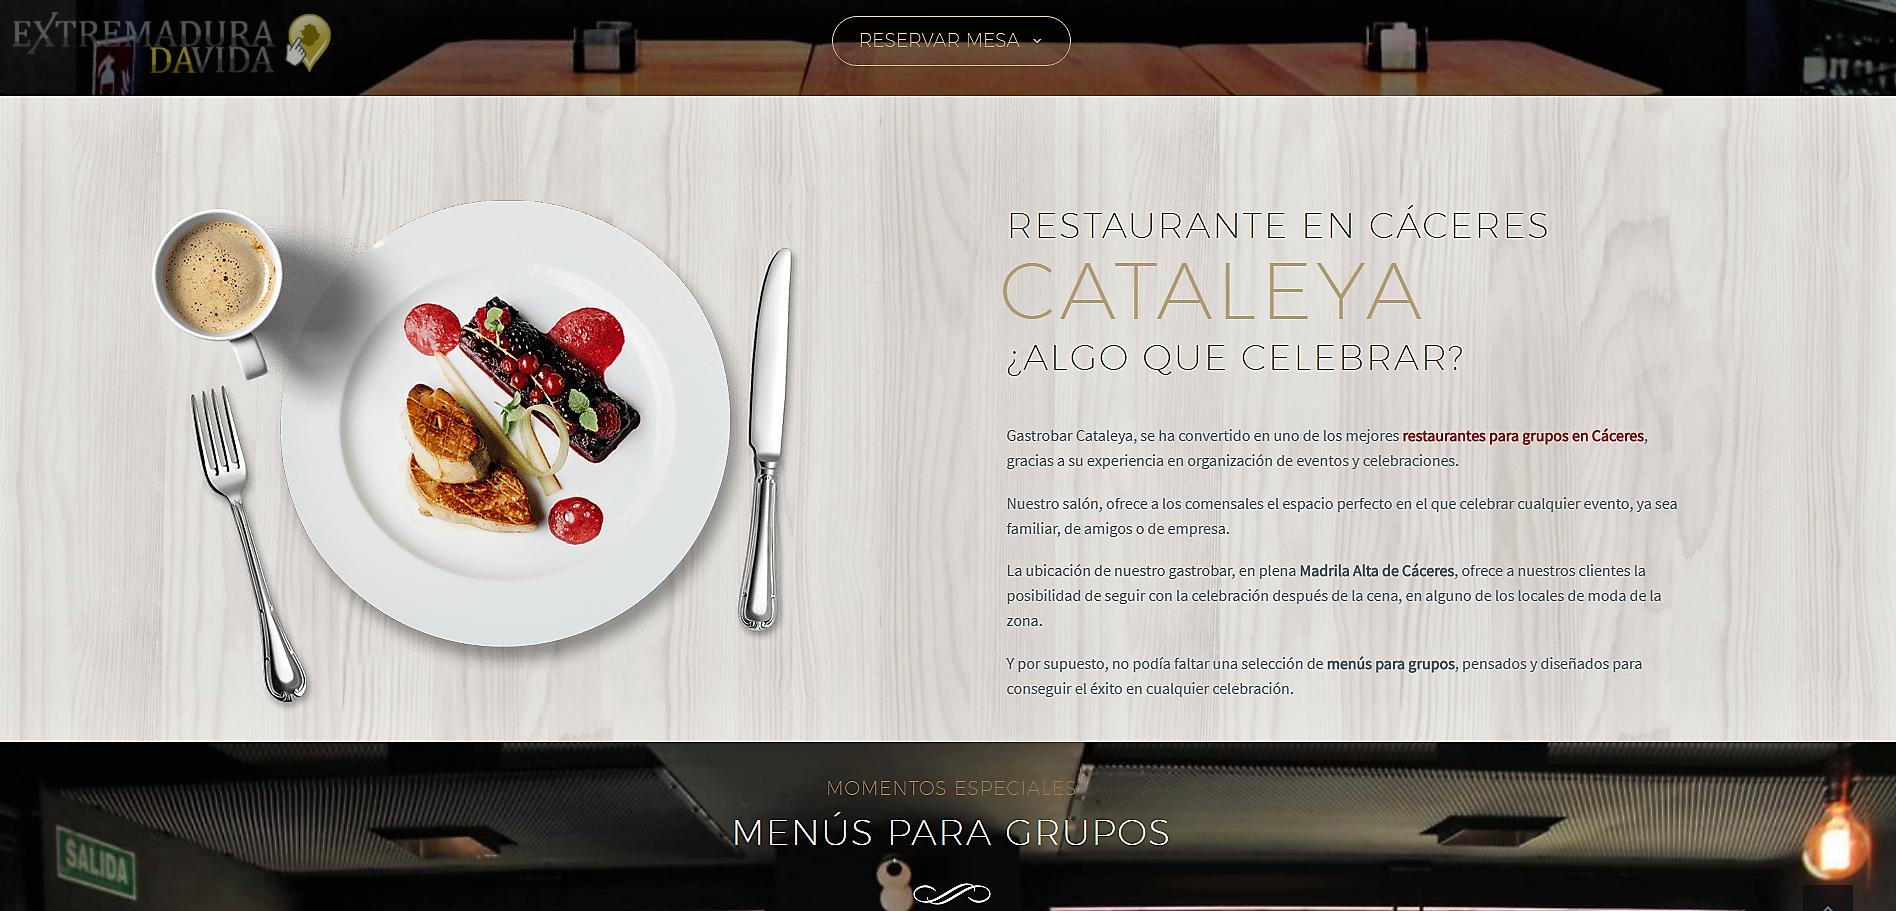 Restaurante en Cáceres Cocina de autor Cataleya Gastrobar